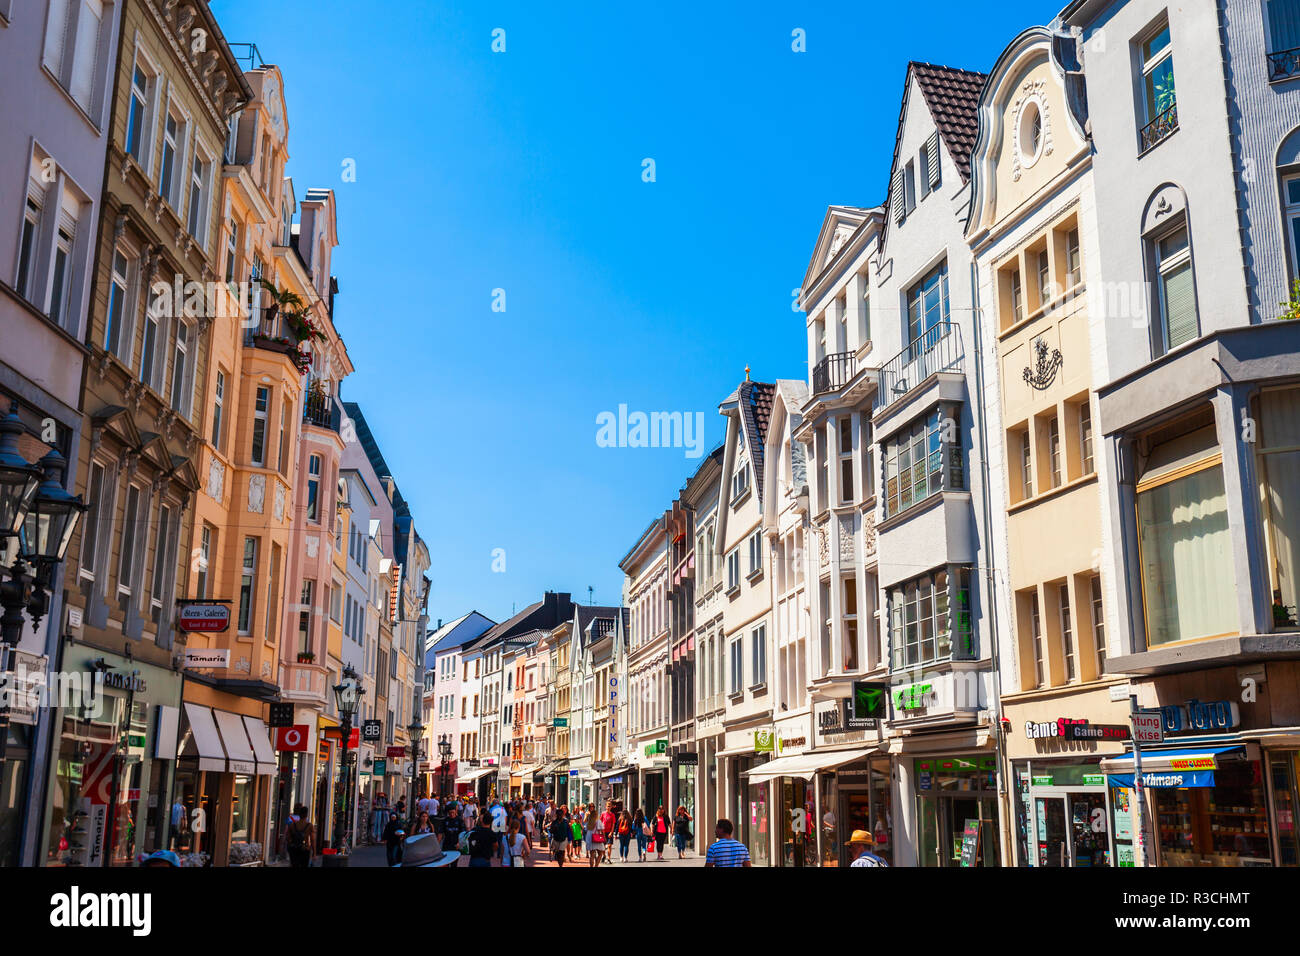 BONN, GERMANY - JUNE 29, 2018: Pedestrian street in the centre of Bonn city in Germany Stock Photo